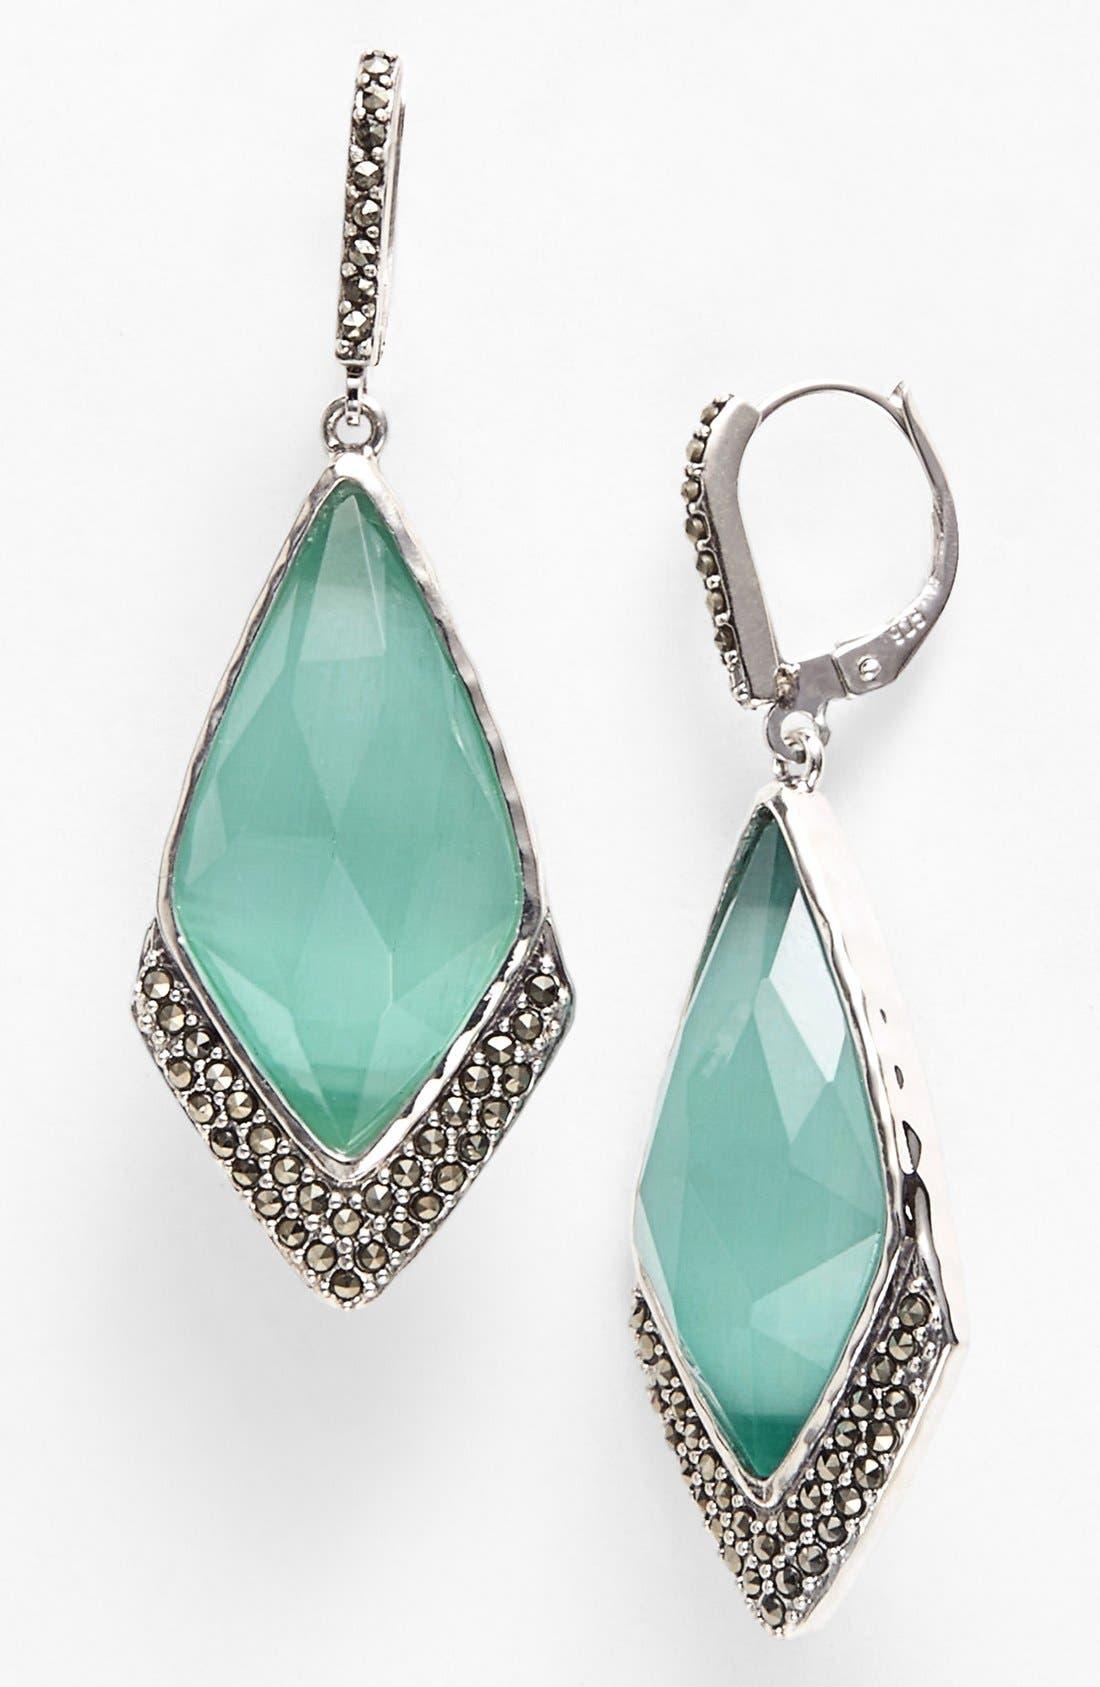 Main Image - Judith Jack 'Mint Elegante' Large Drop Earrings